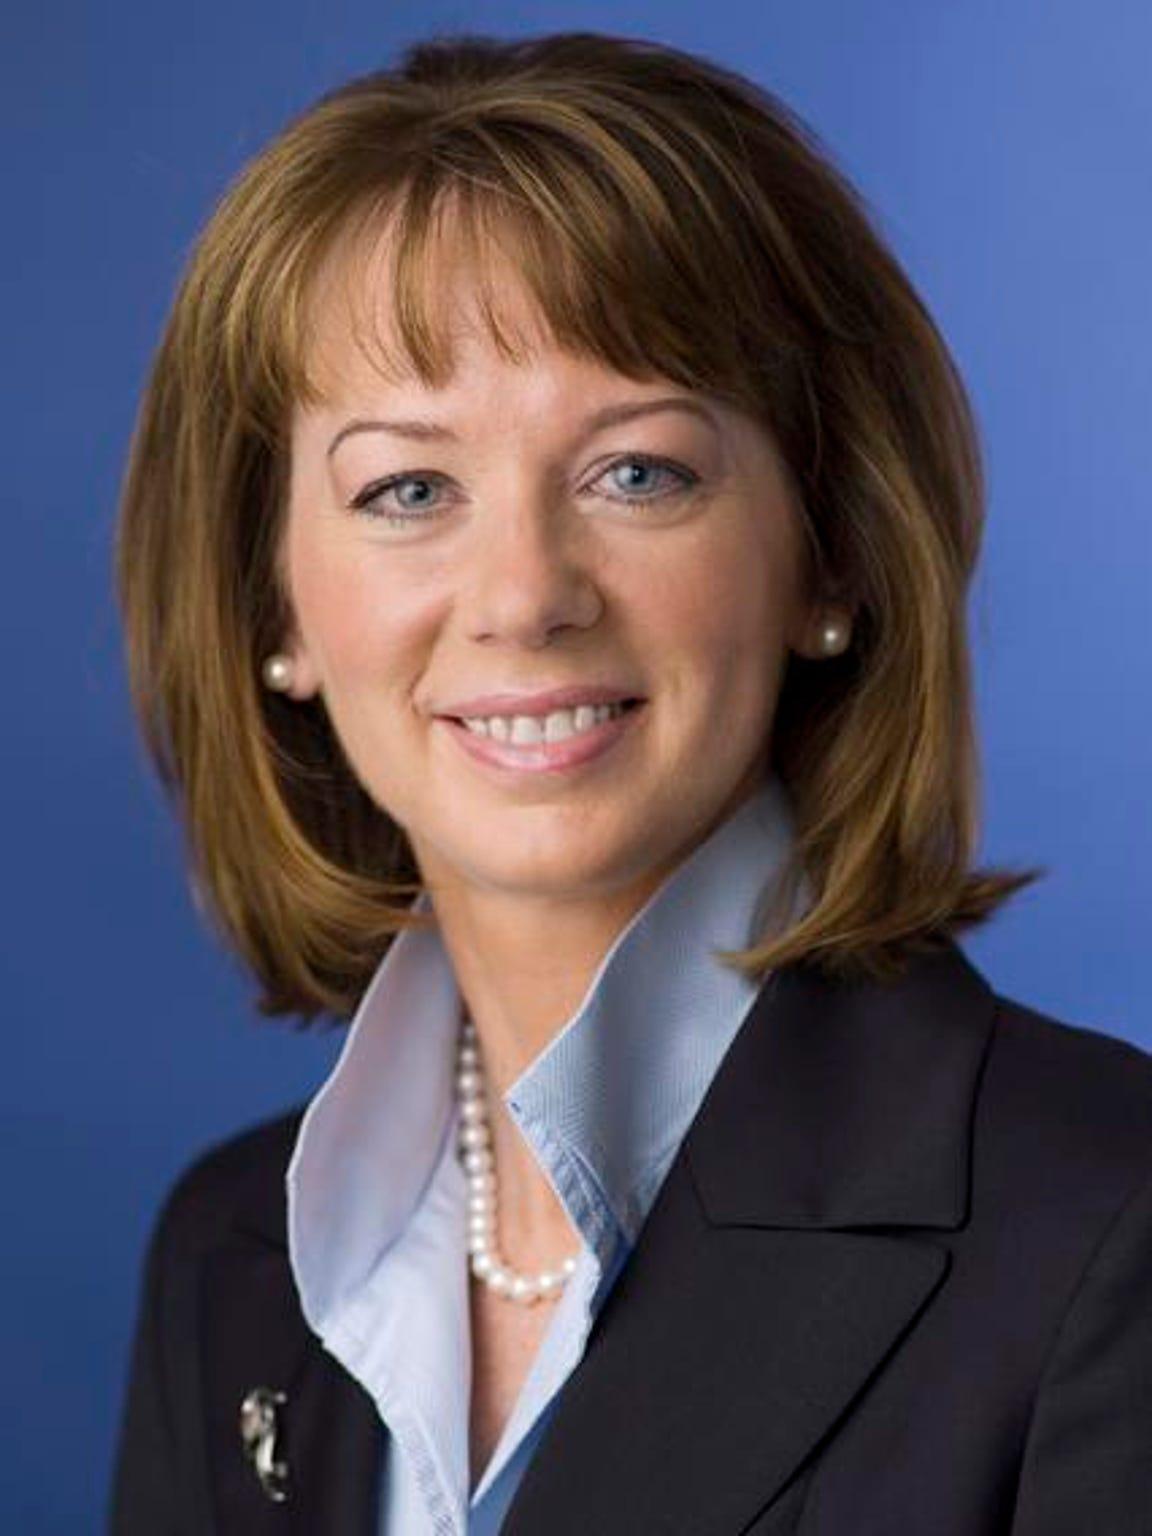 Digital Medical Solutions President Diana Nole.